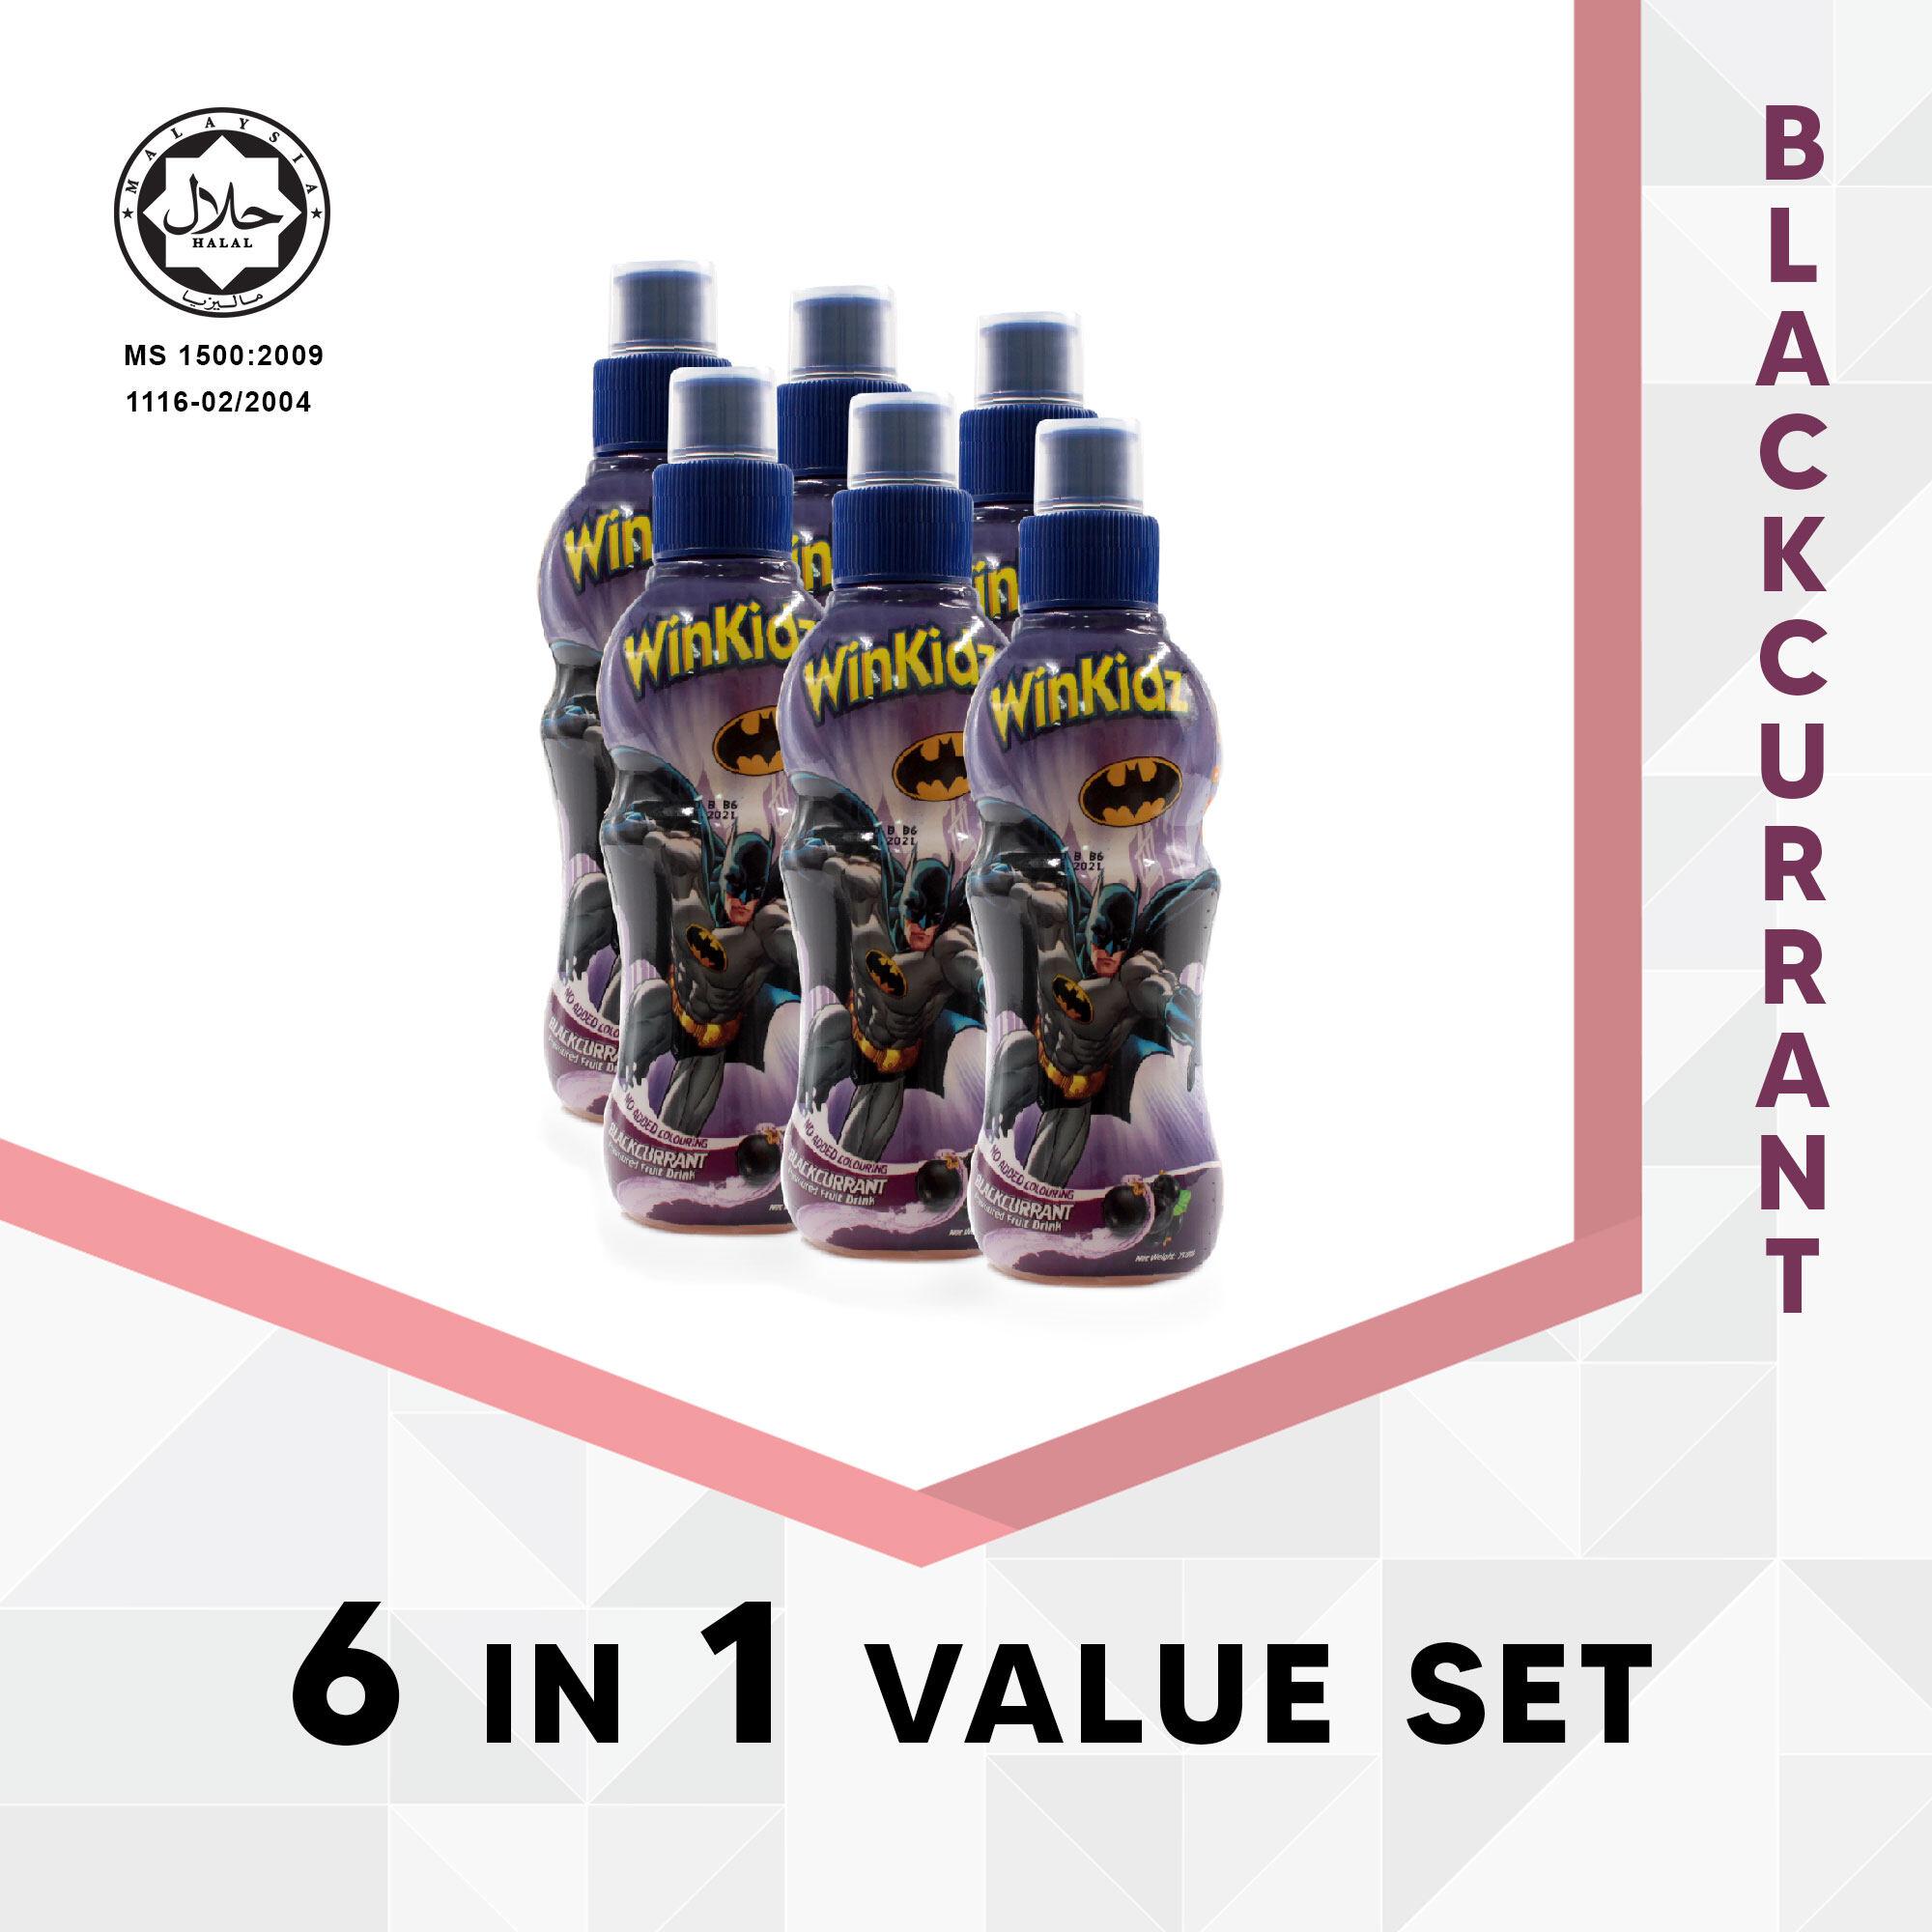 DC Comic Winkidz Batman Fruit Drink For Children 6 In 1 Value Set 250Ml X 6 - Blackcurrant